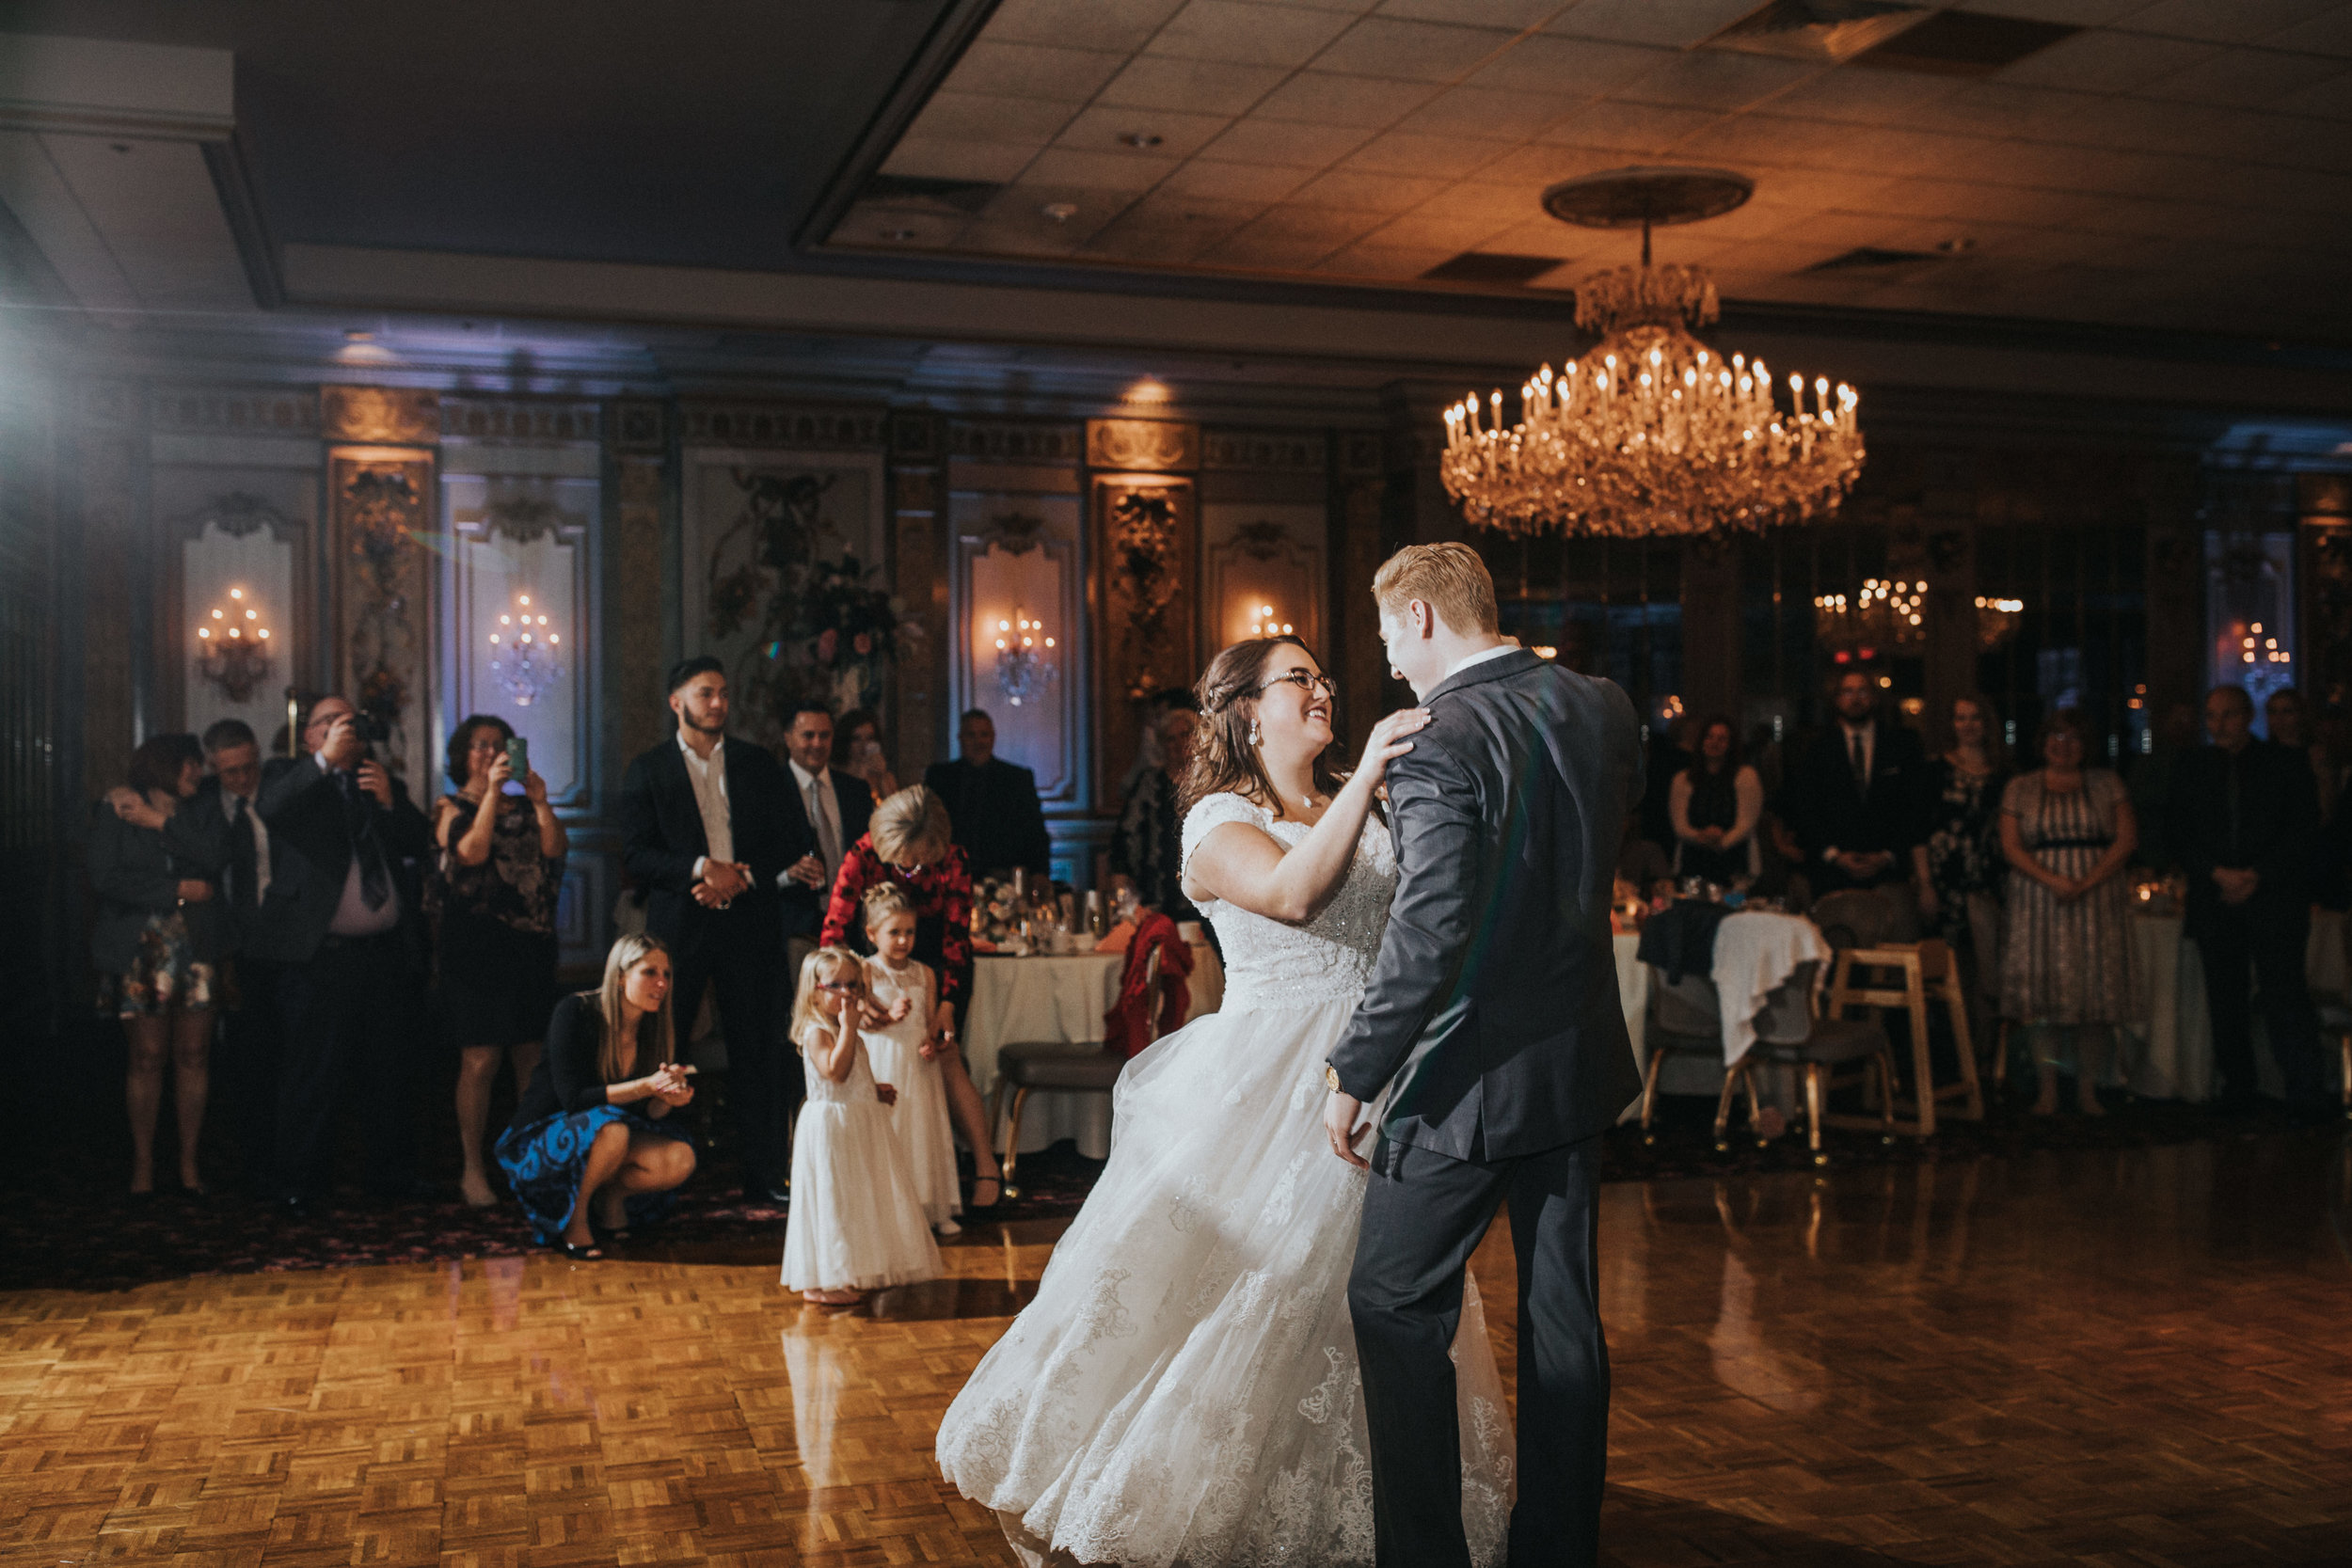 New-Jersey-Wedding-Photography-Fishers-Tudor-House-JennaLynnPhotography-Reception-Kathleen&Eddie-16.jpg